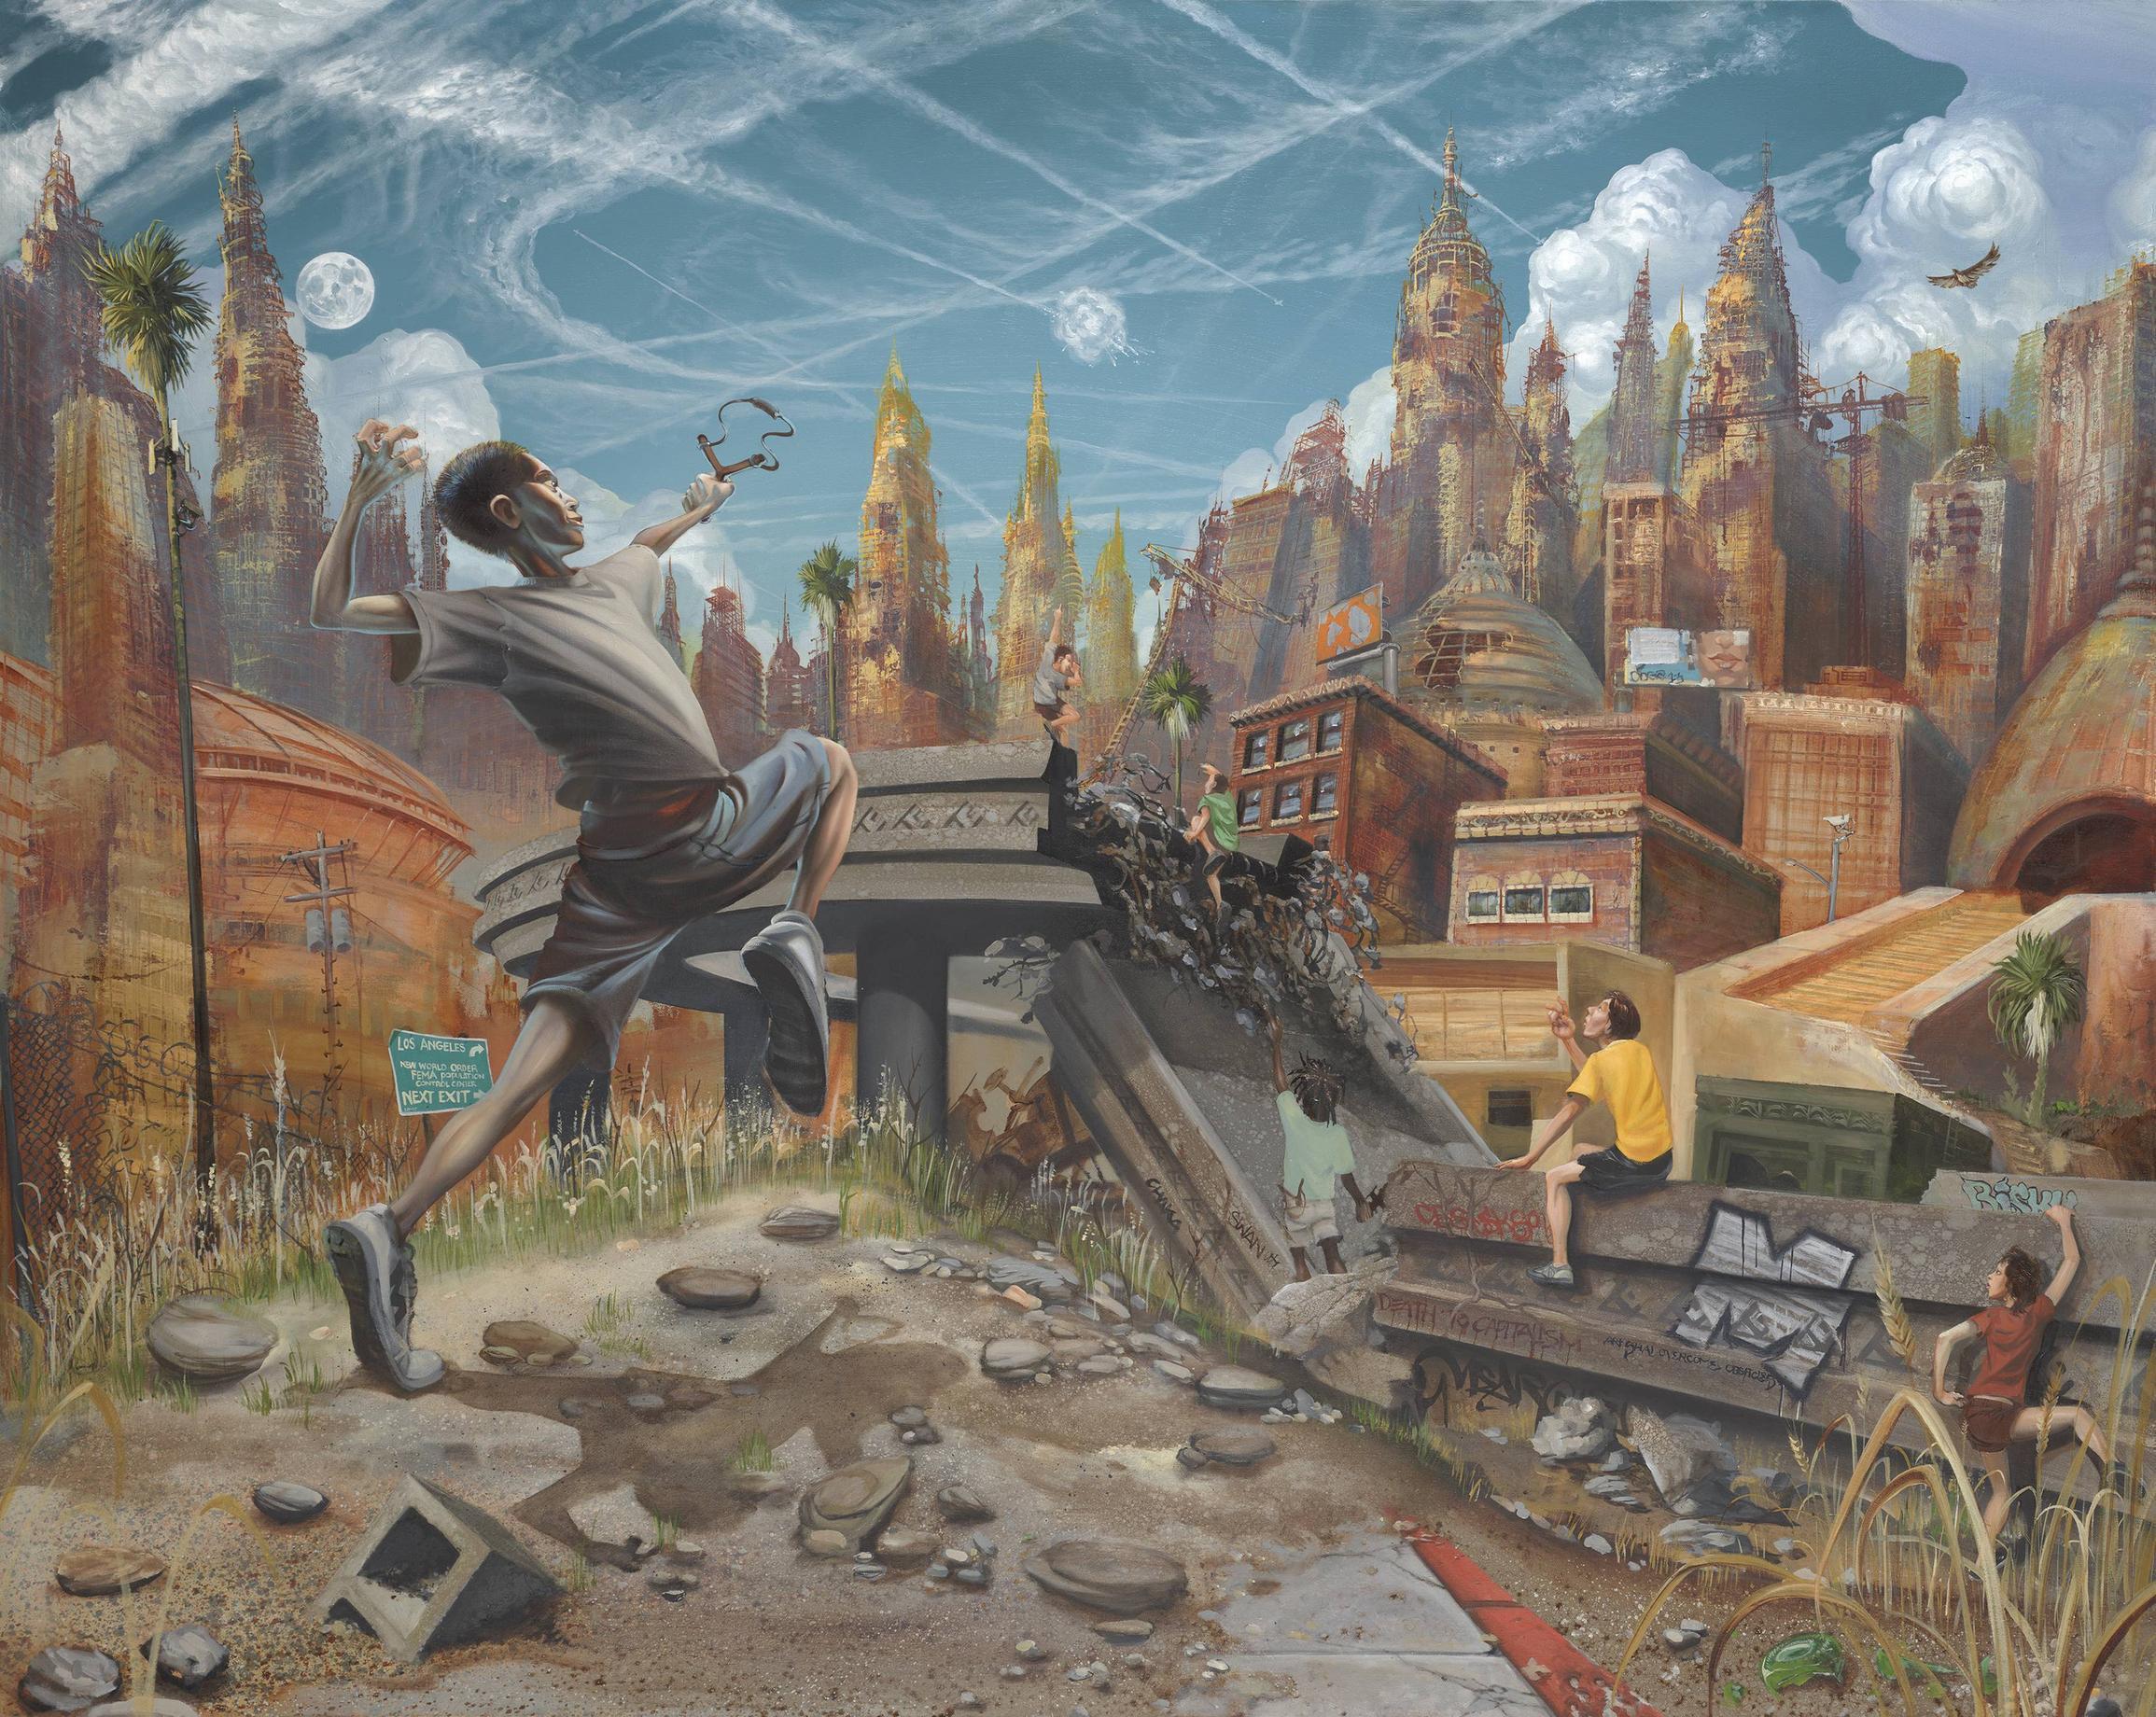 Freeport - David & Goliath 54/100